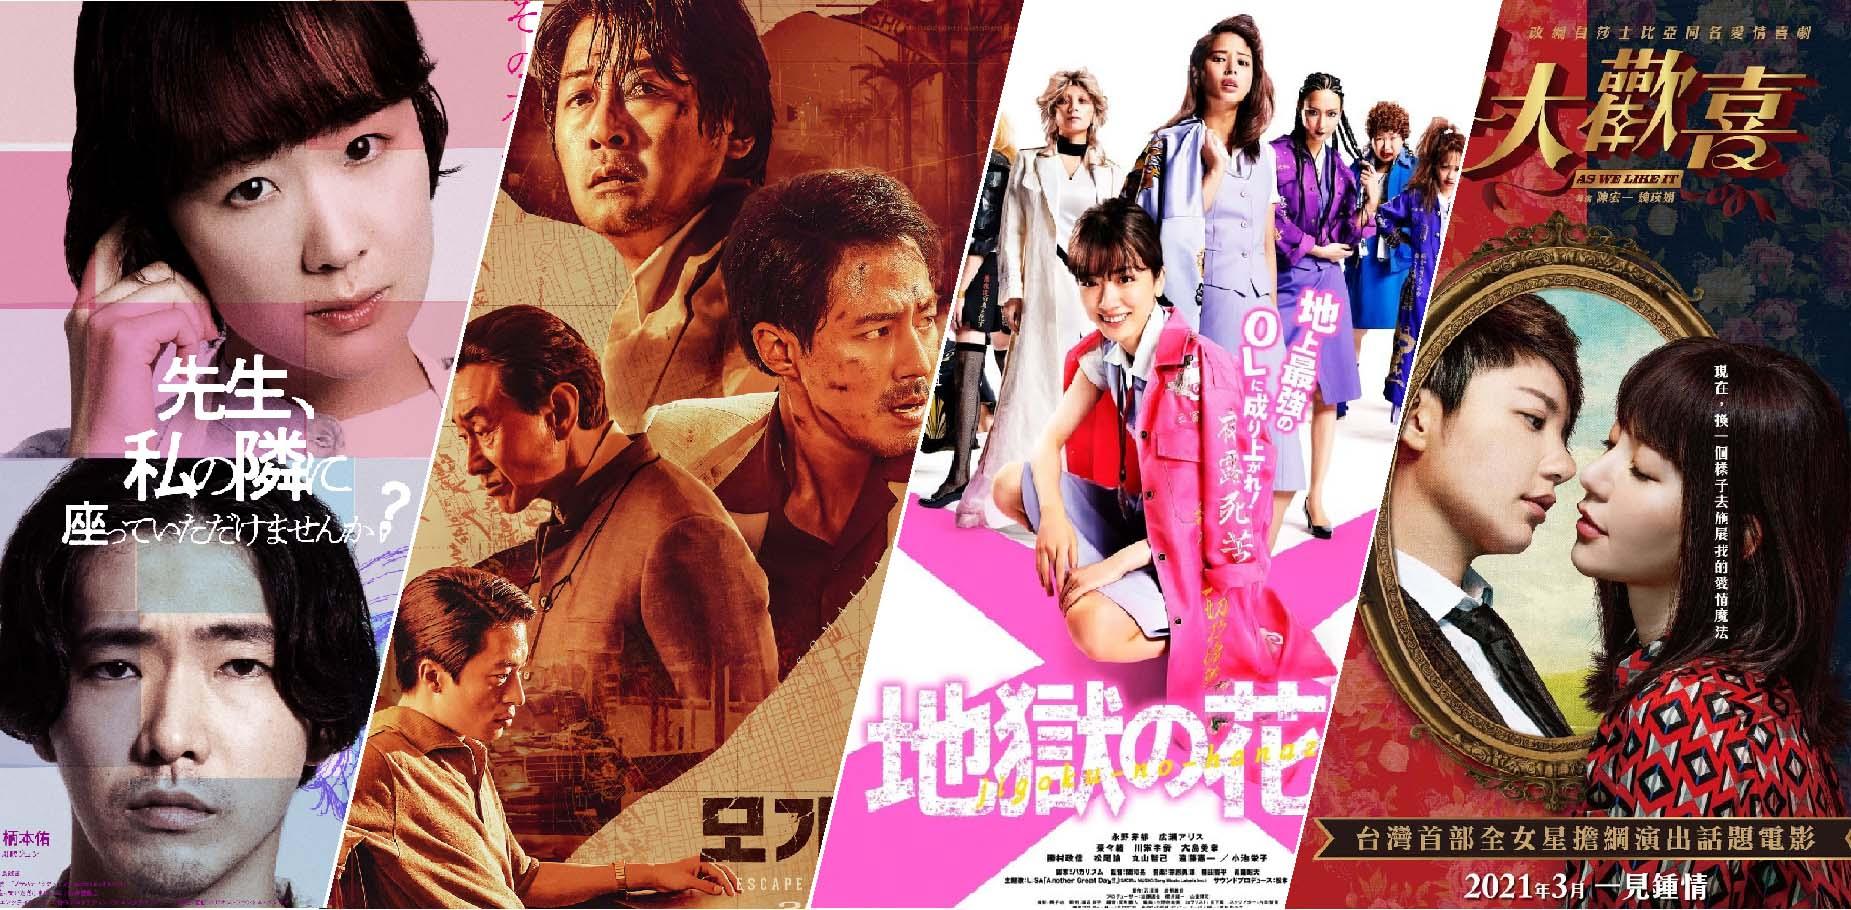 Phim châu Á hay năm 2021 - 18